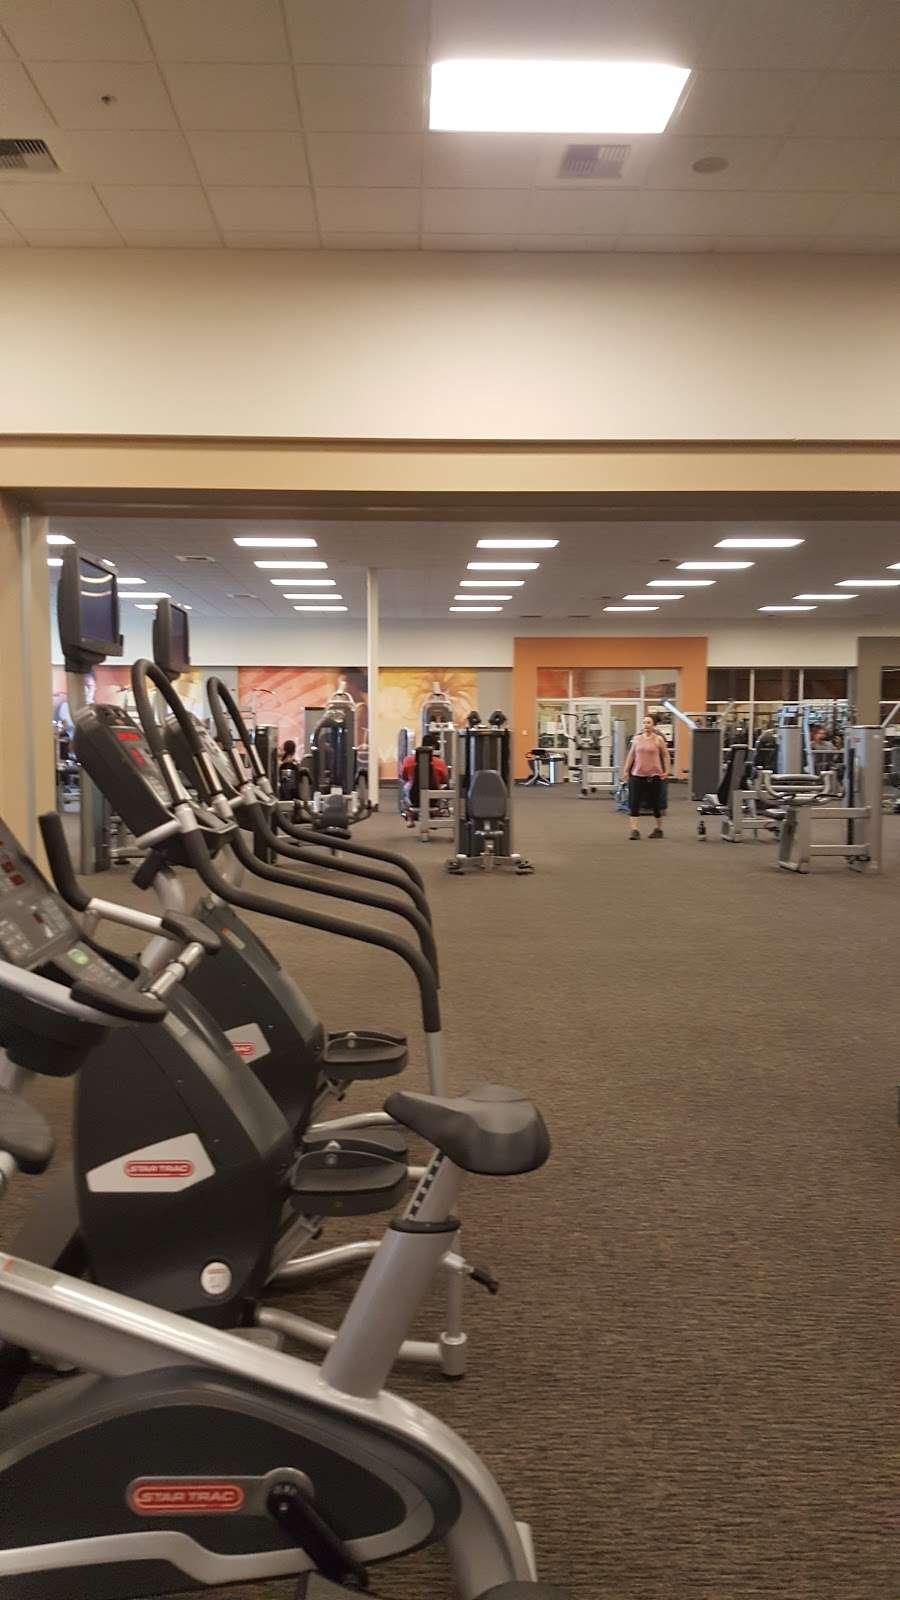 LA Fitness - gym    Photo 9 of 10   Address: 27610 Eucalyptus Ave, Moreno Valley, CA 92555, USA   Phone: (951) 571-8039